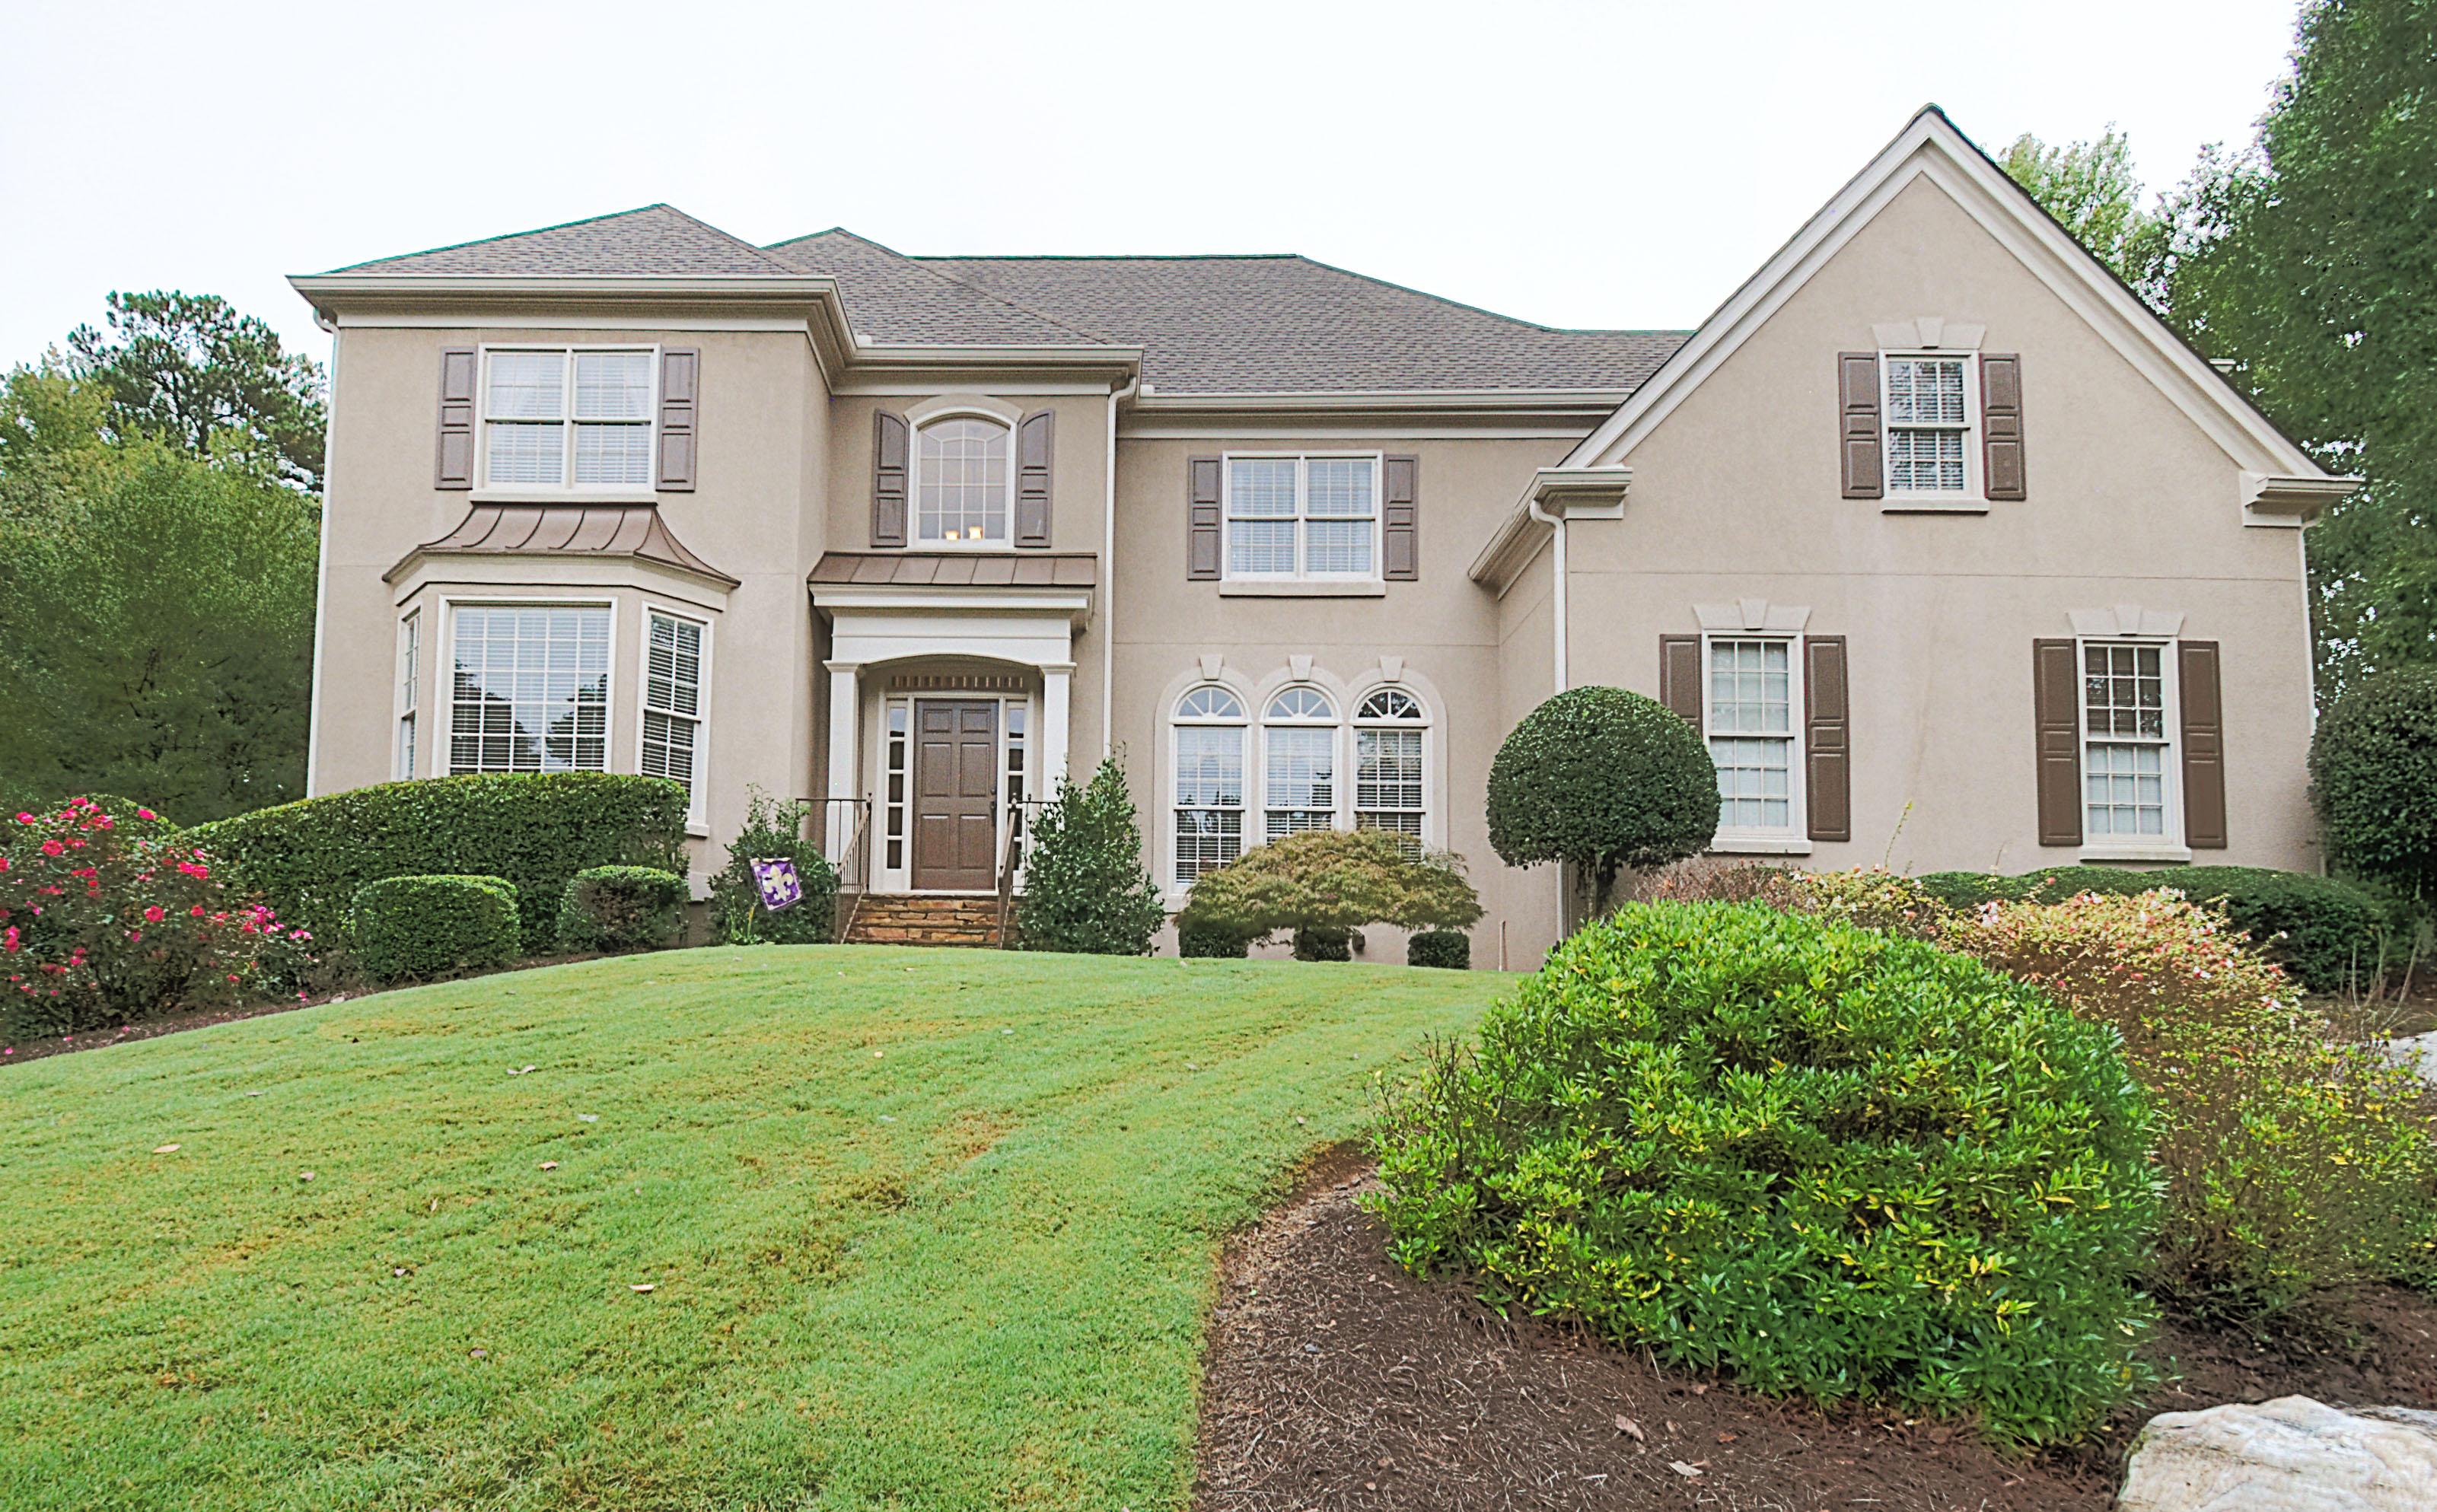 独户住宅 为 销售 在 Exceptional Opportunity in Oxford Mill 10175 Brier Mill Court Johns Creek, 乔治亚州 30022 美国